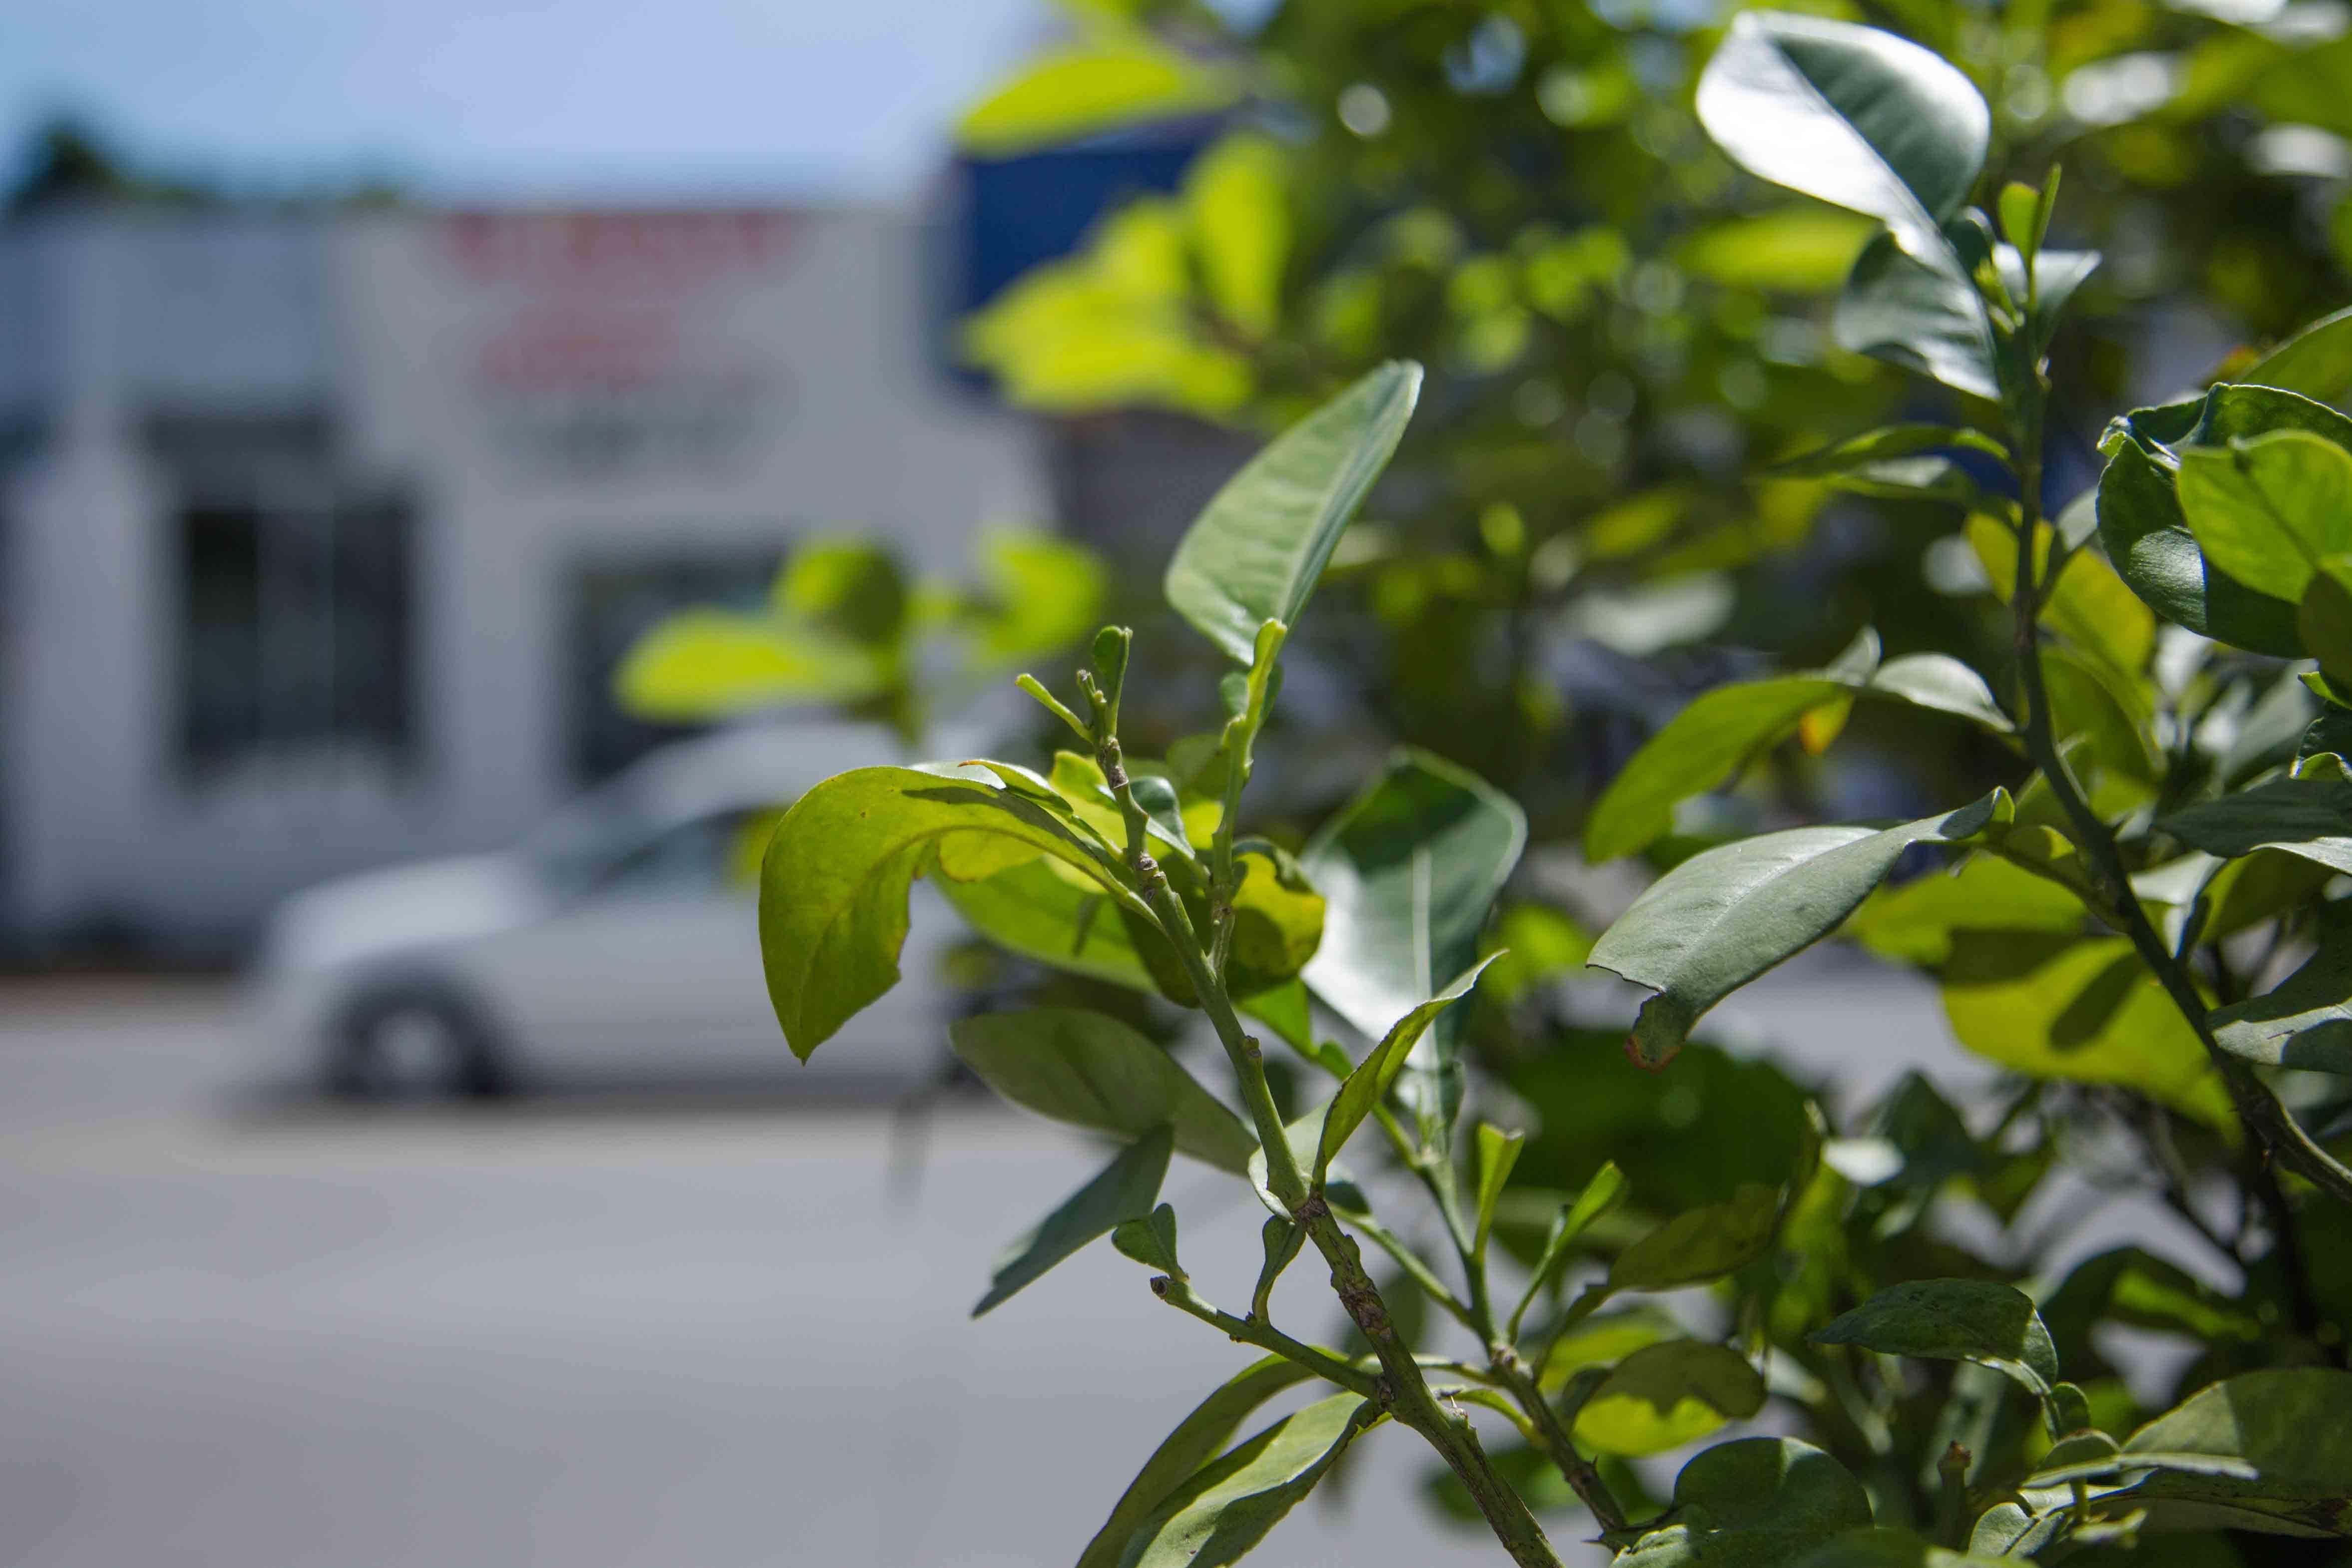 Árbol frutal en zona urbana.